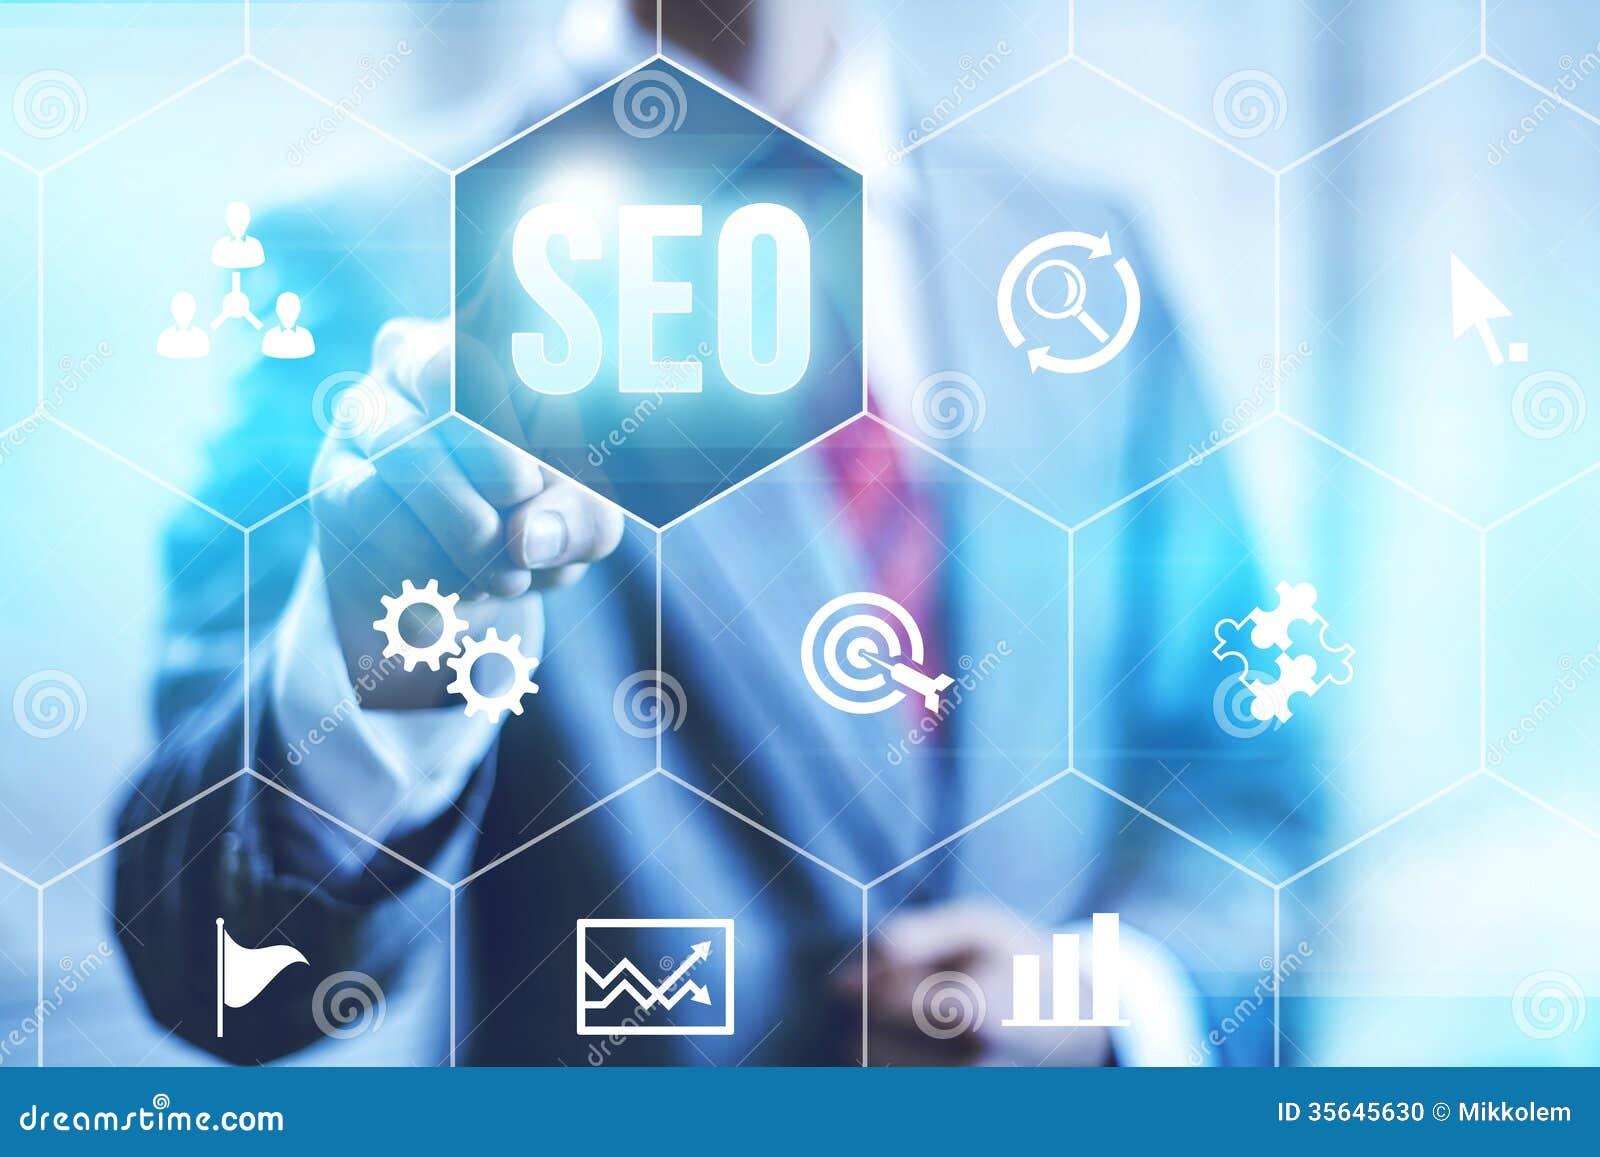 Search Engine Optimization Definition - Entrepreneur Small ...